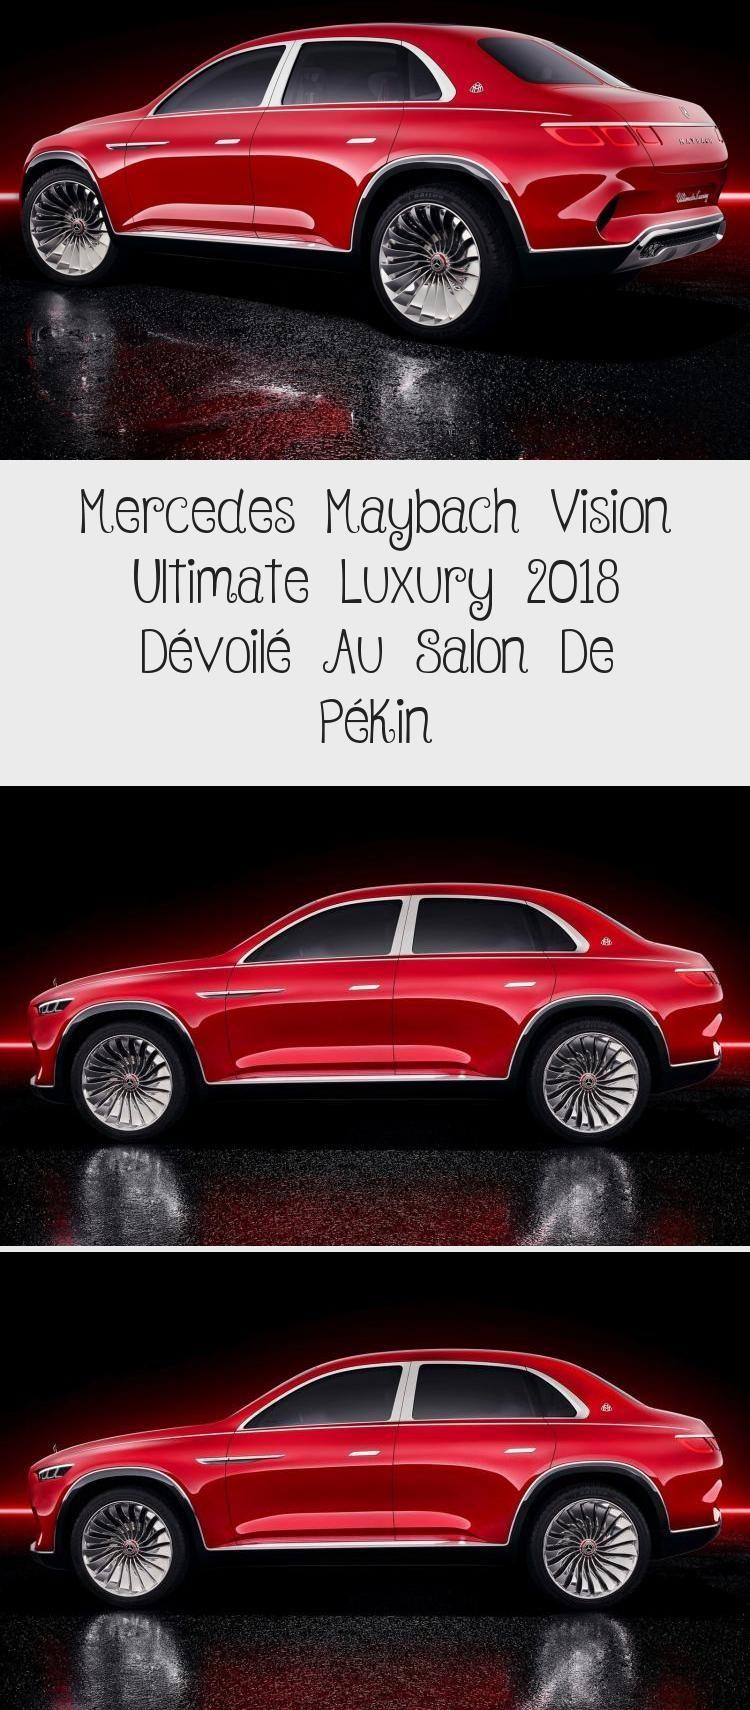 Mercedes Maybach Vision Ultimate Luxury 2018 dévoilé au salon de Pekin #Firstcars #carsAccessories #Blackcars #carsPhotography #Smallcars